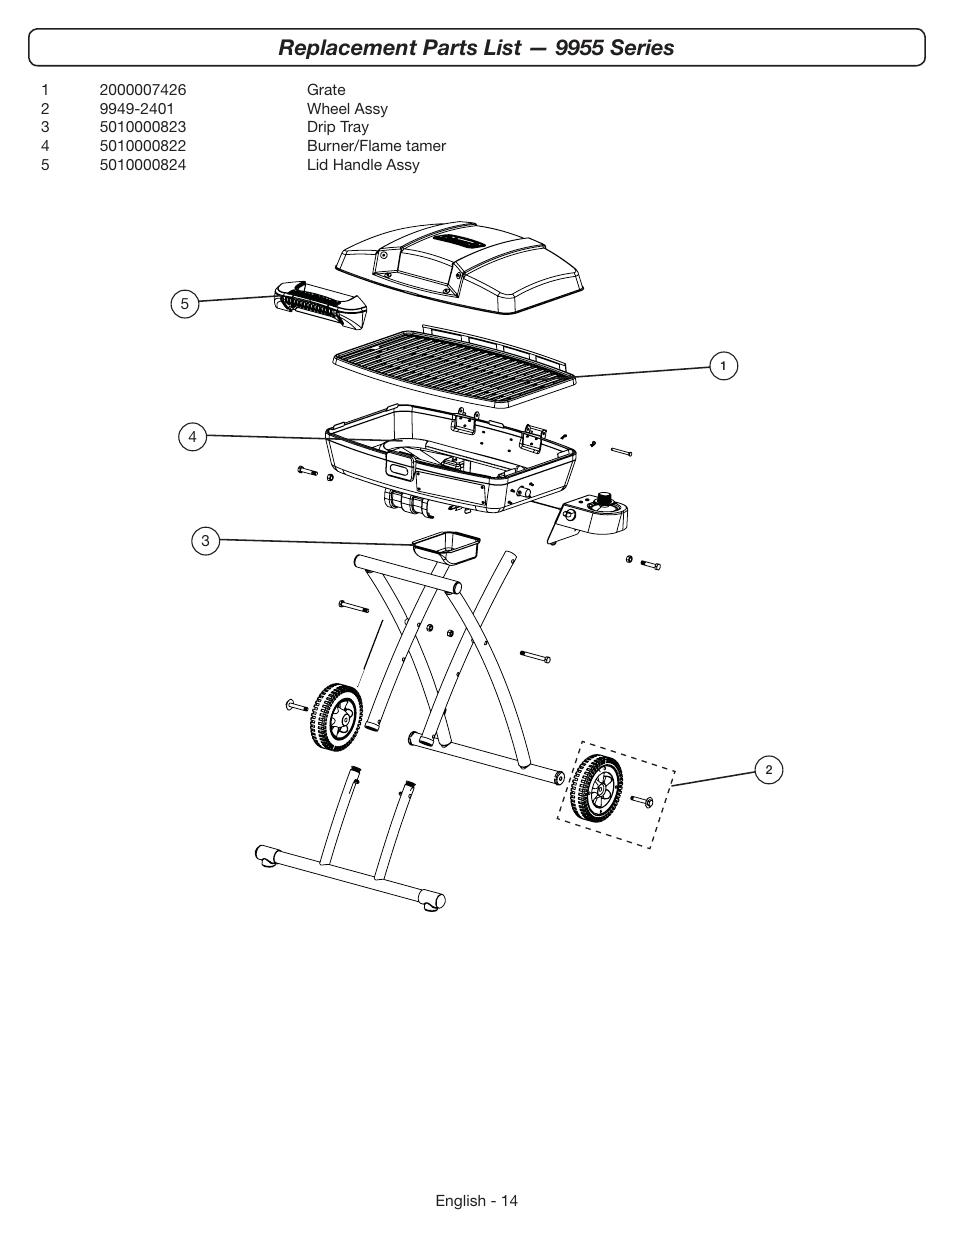 [DIAGRAM] Citroen Bx Series Ii Original Parts List In pdf